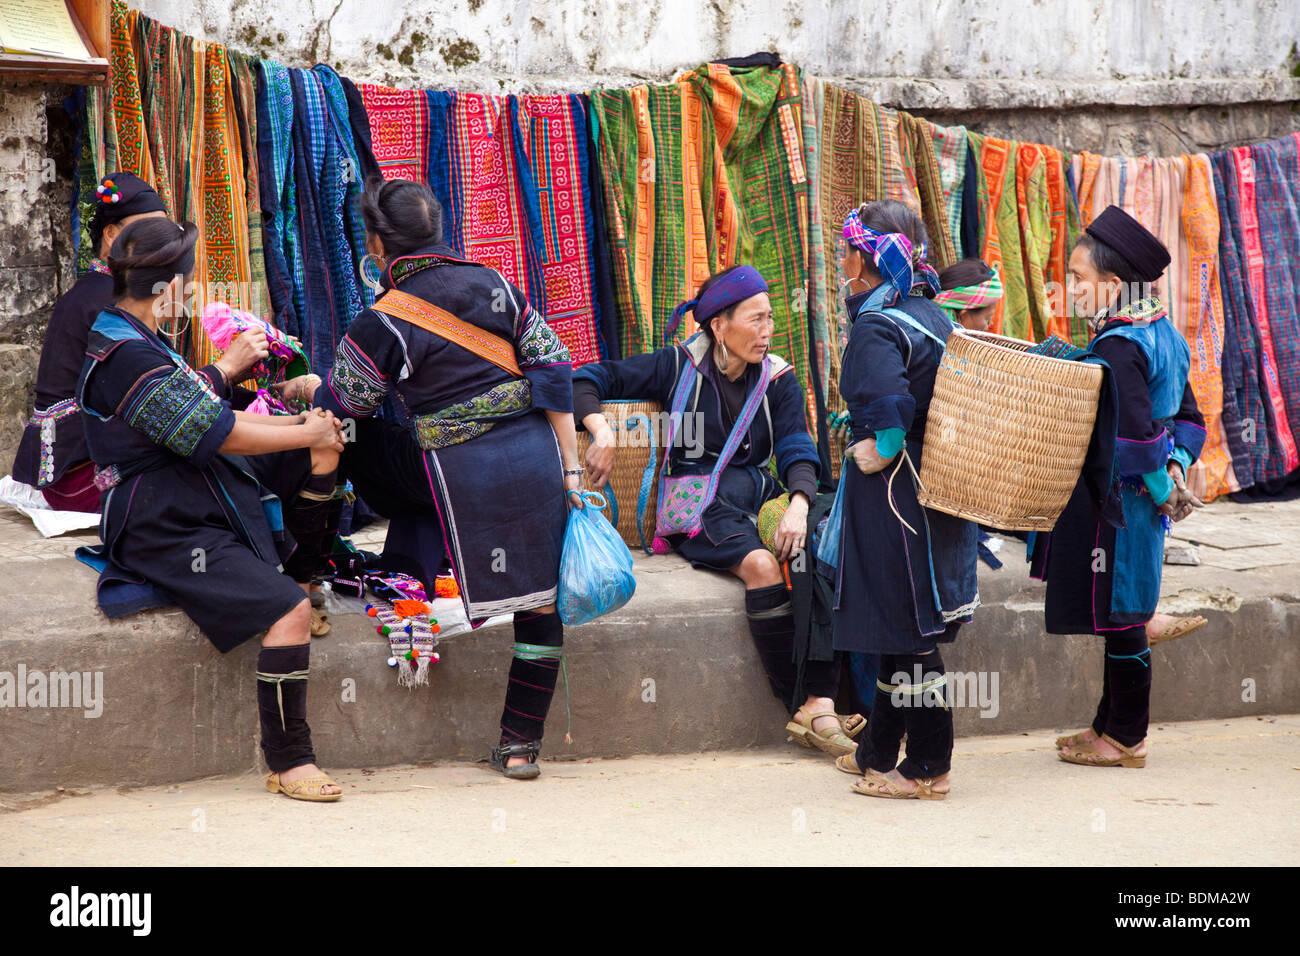 Hmong lady in Sapa, North Vietnam - Stock Image